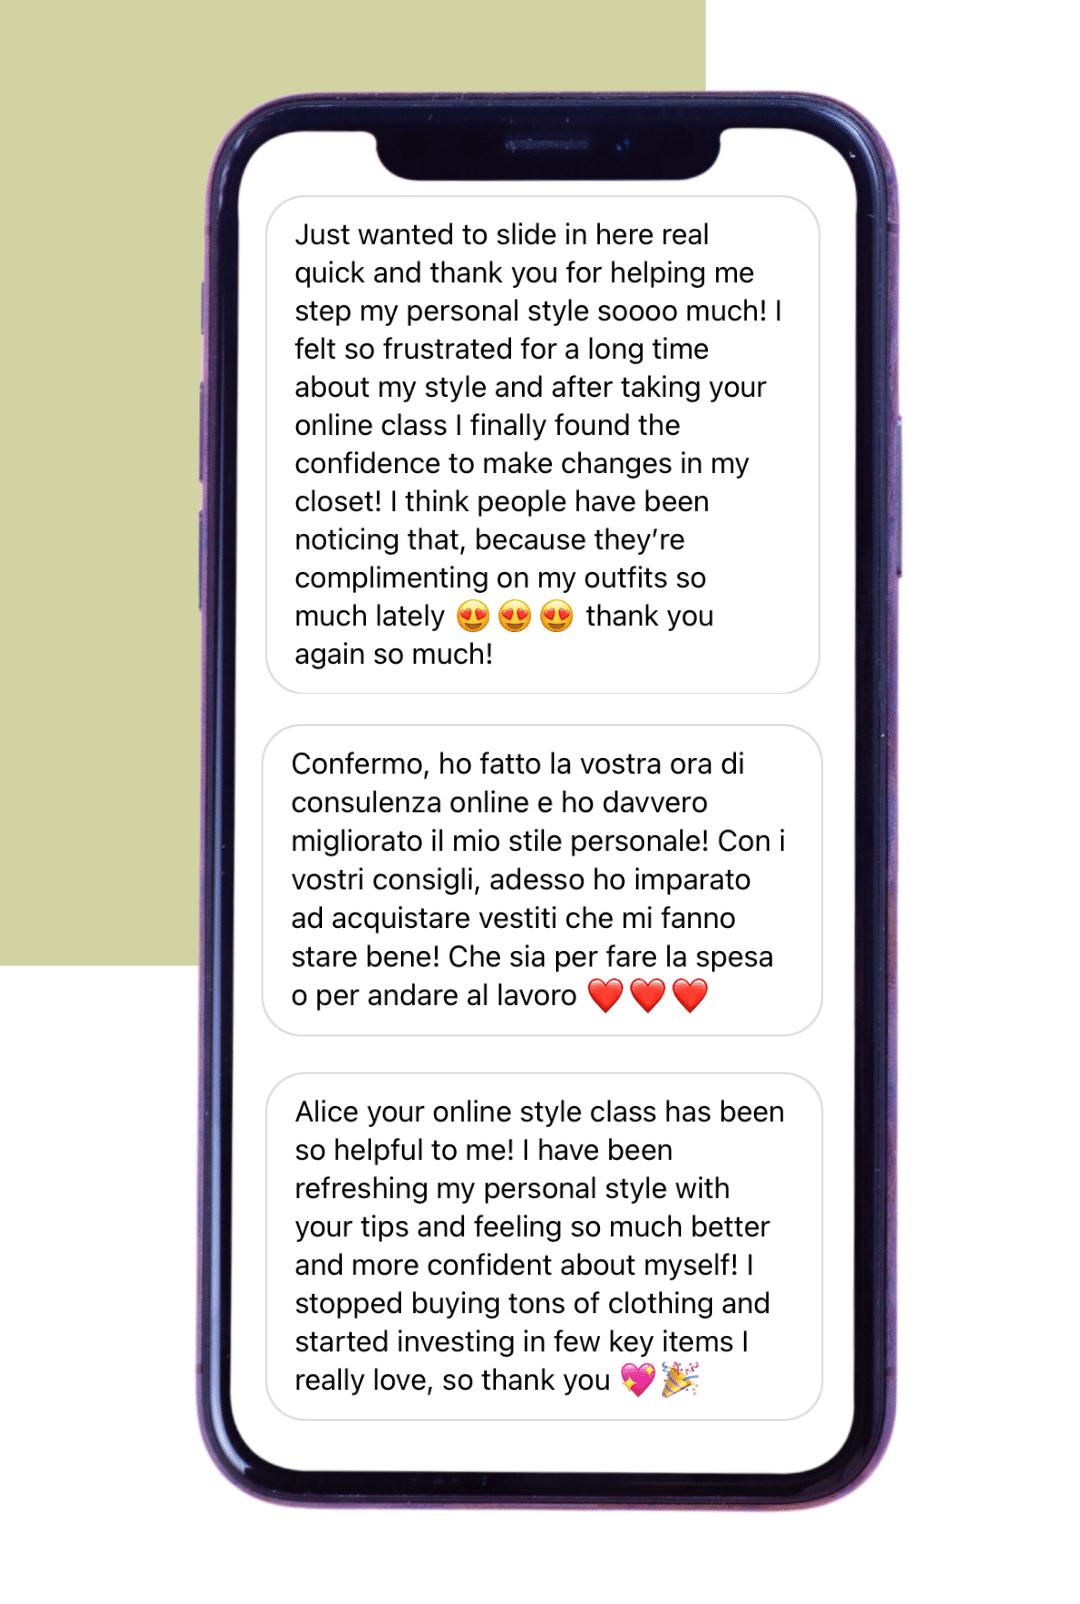 Screenshots of customers' reviews